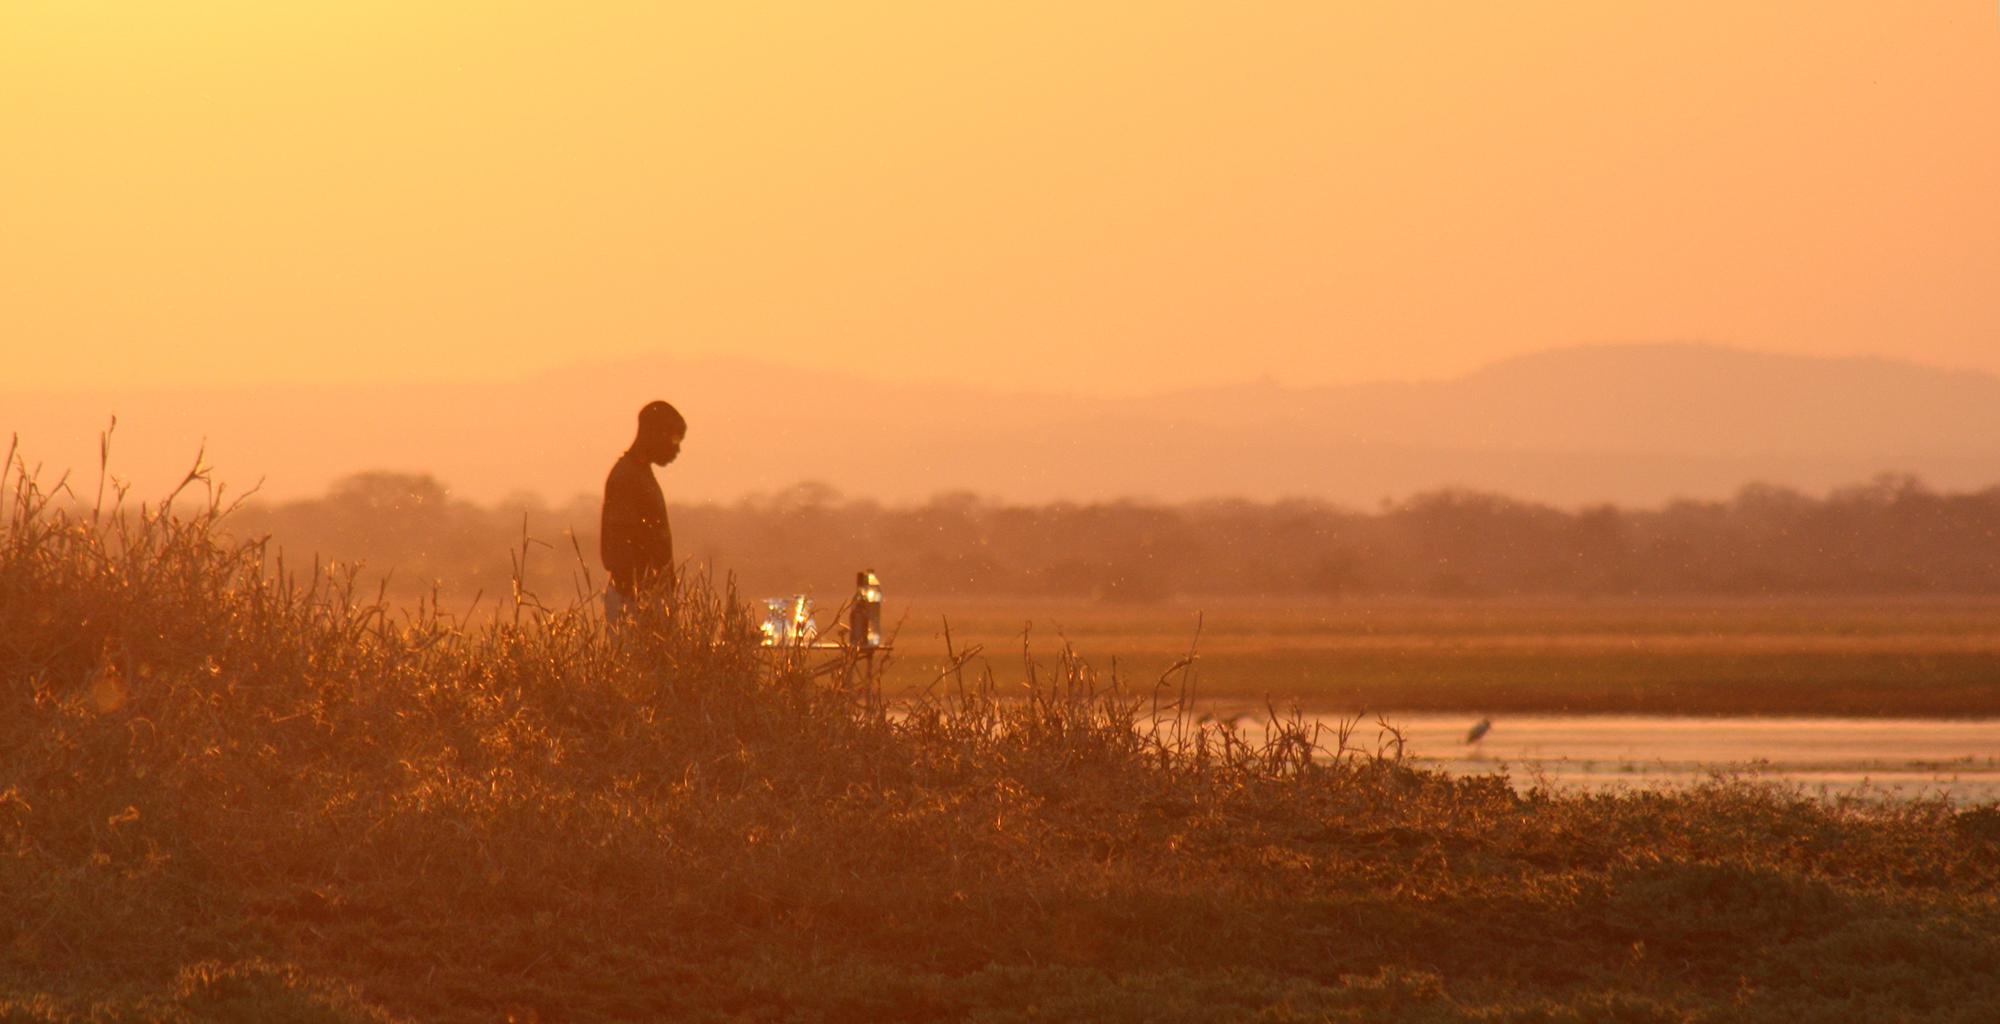 Mozambique-Gorongosa-National-Park-Explora-Gorongosa-Private-Dining-Sunset